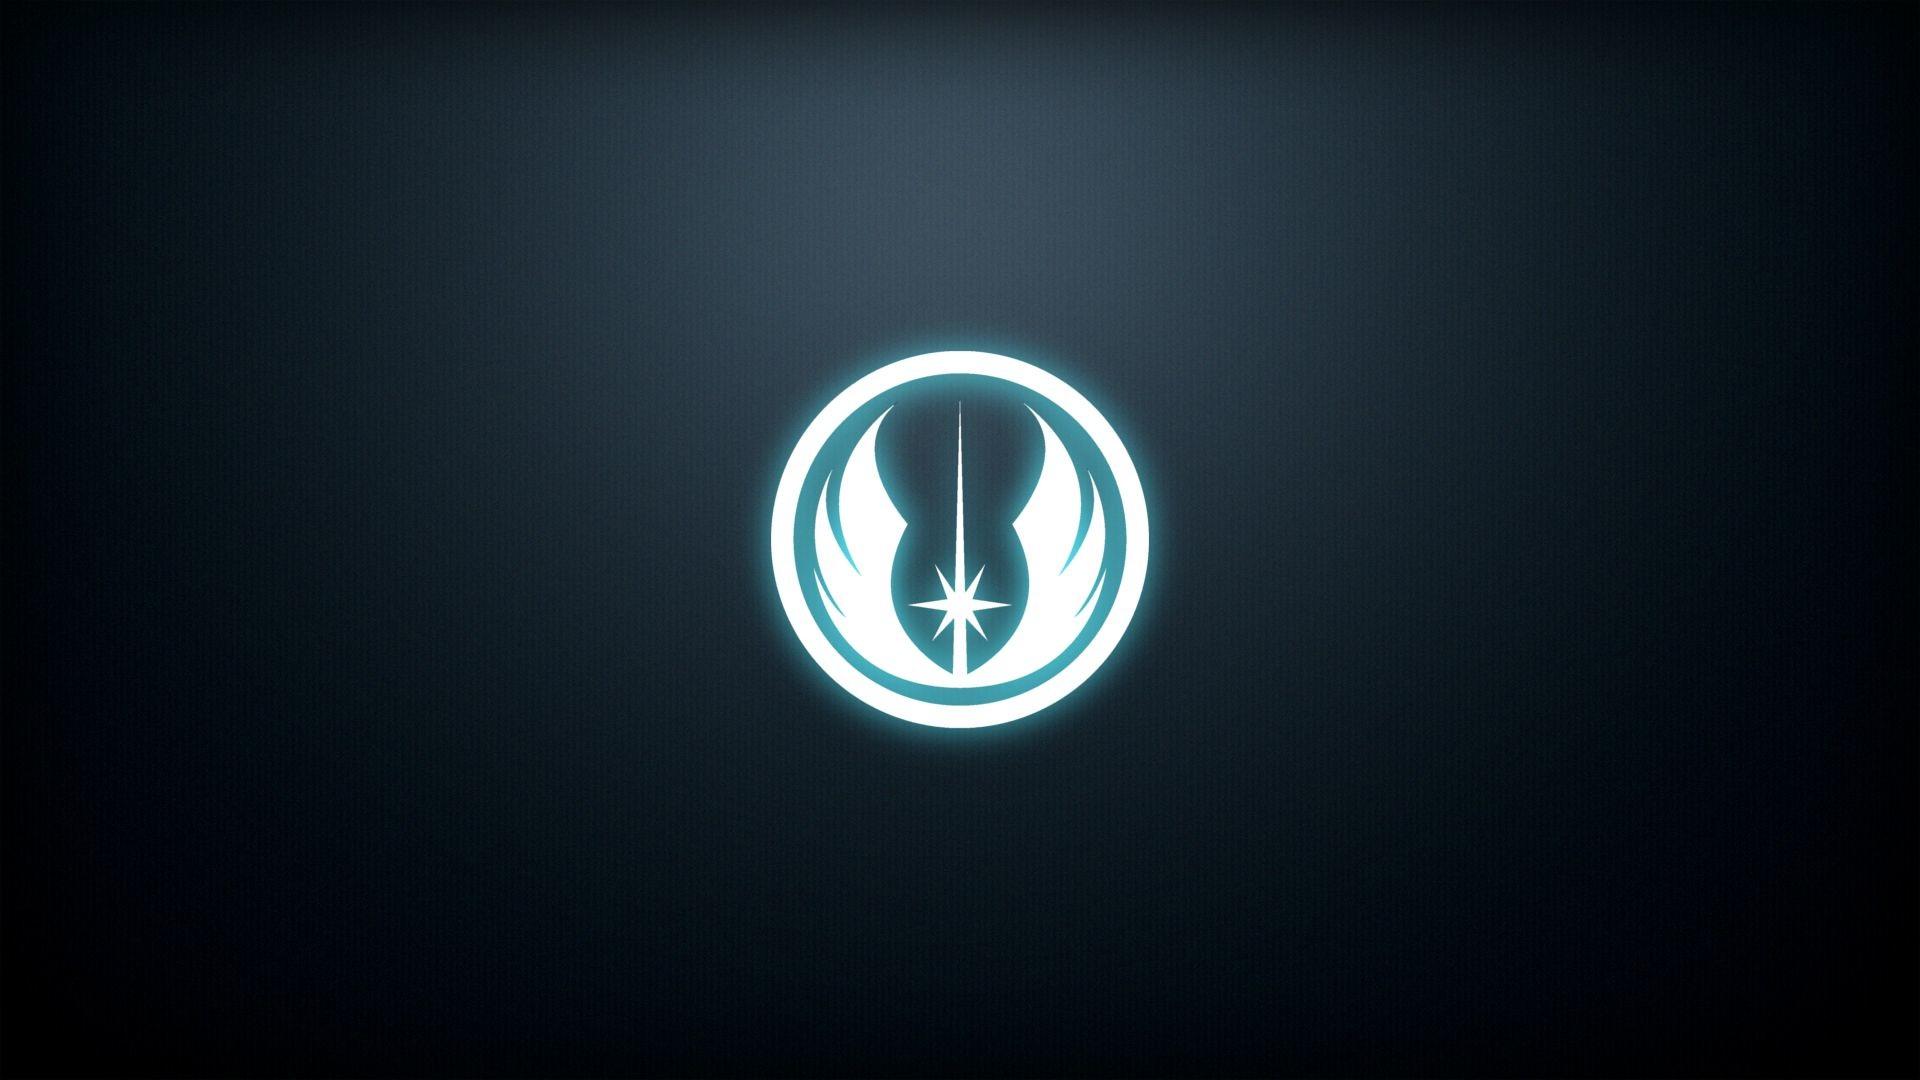 Cars Symbol Wallpaper Jedi Logo Wallpaper 78 Images